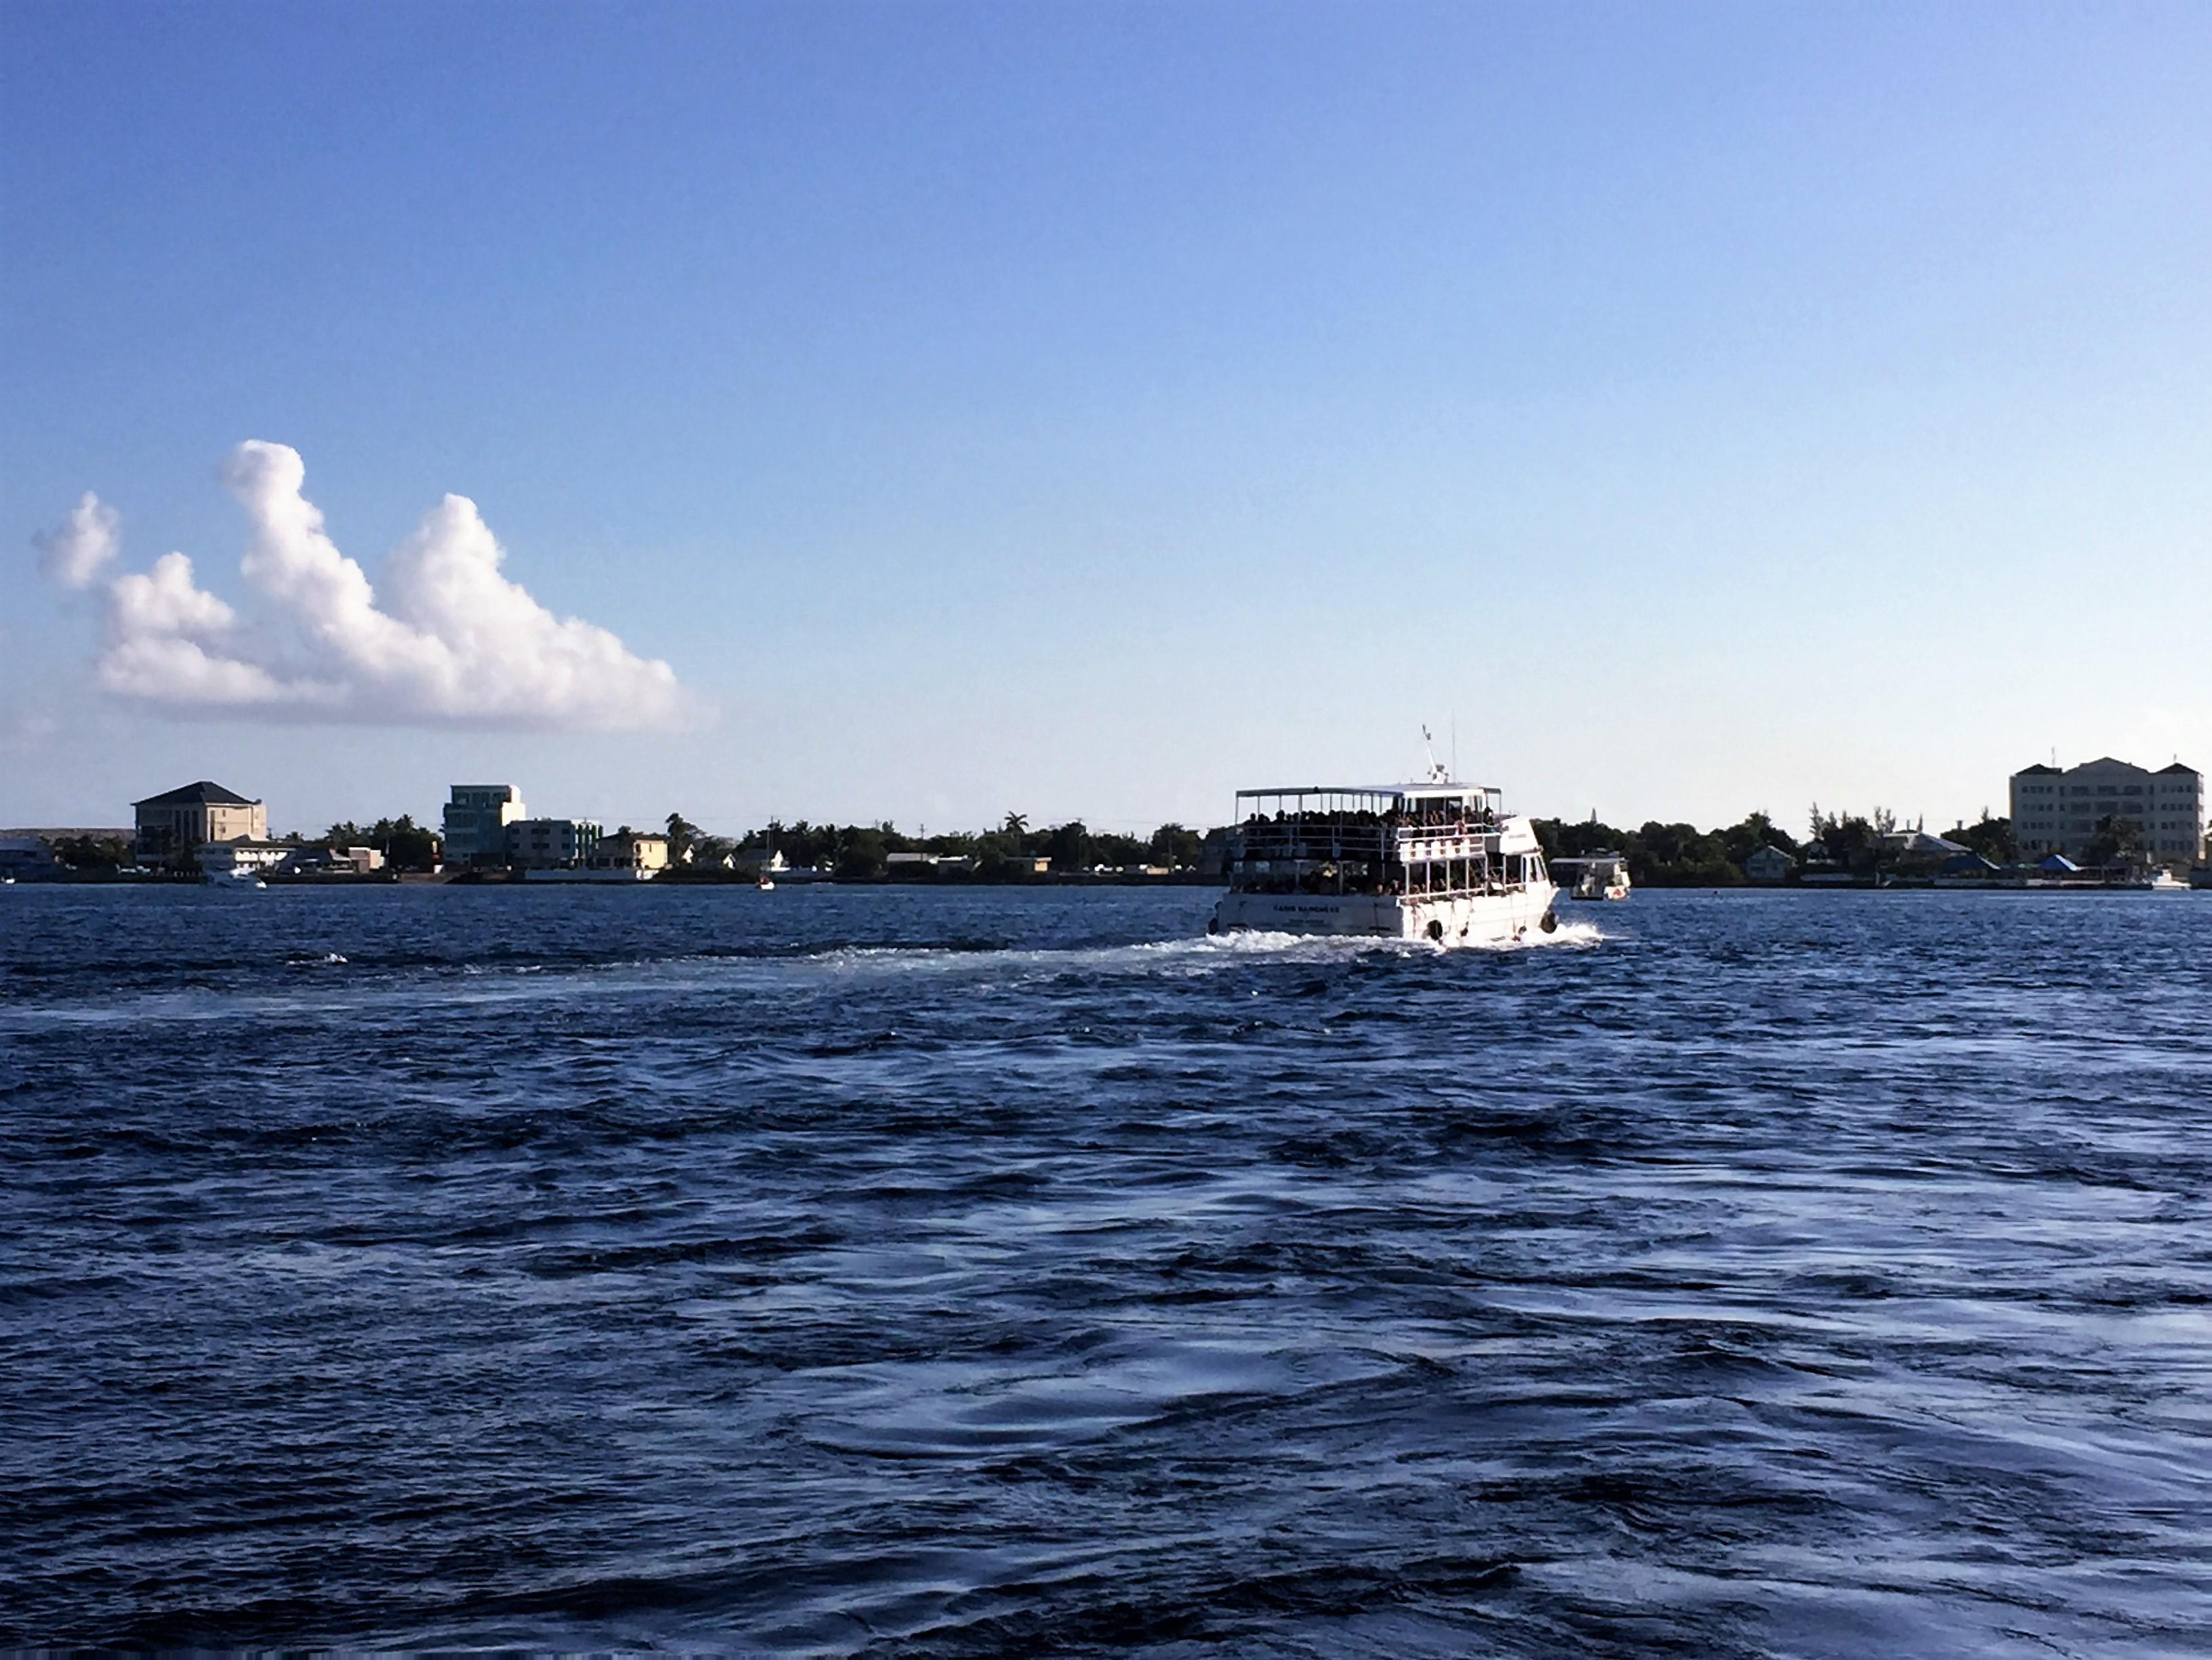 Ausflugsboot auf dem Weg zu Stingray City